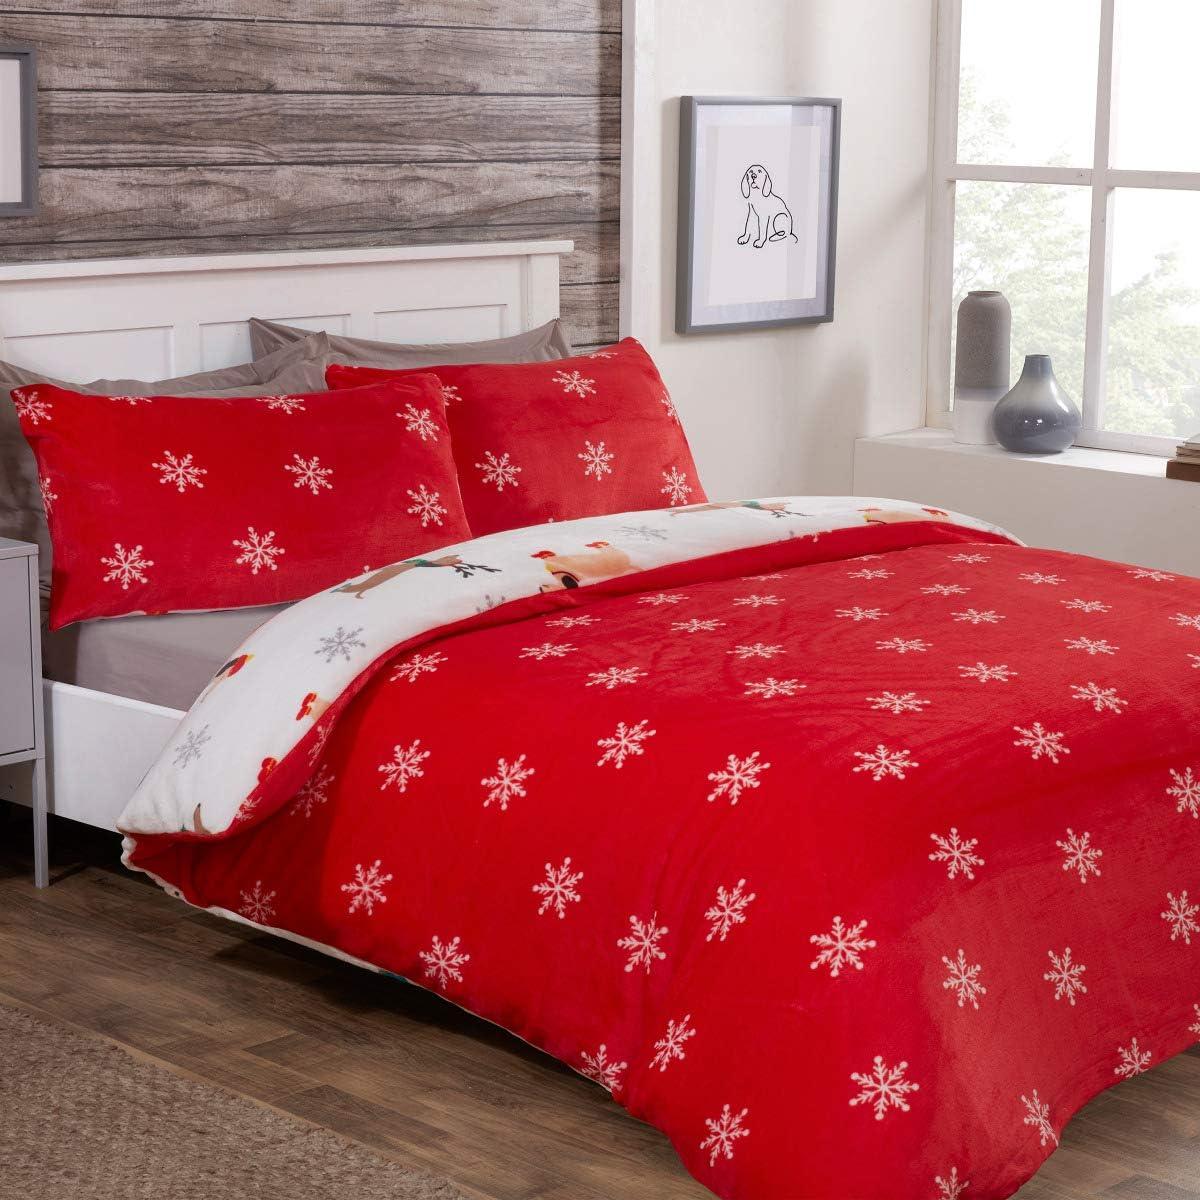 Sleepdown Winter Sausage Dogs Flannel Fleece-Double Reversible Bedding Set and Pillowcases Multicolour